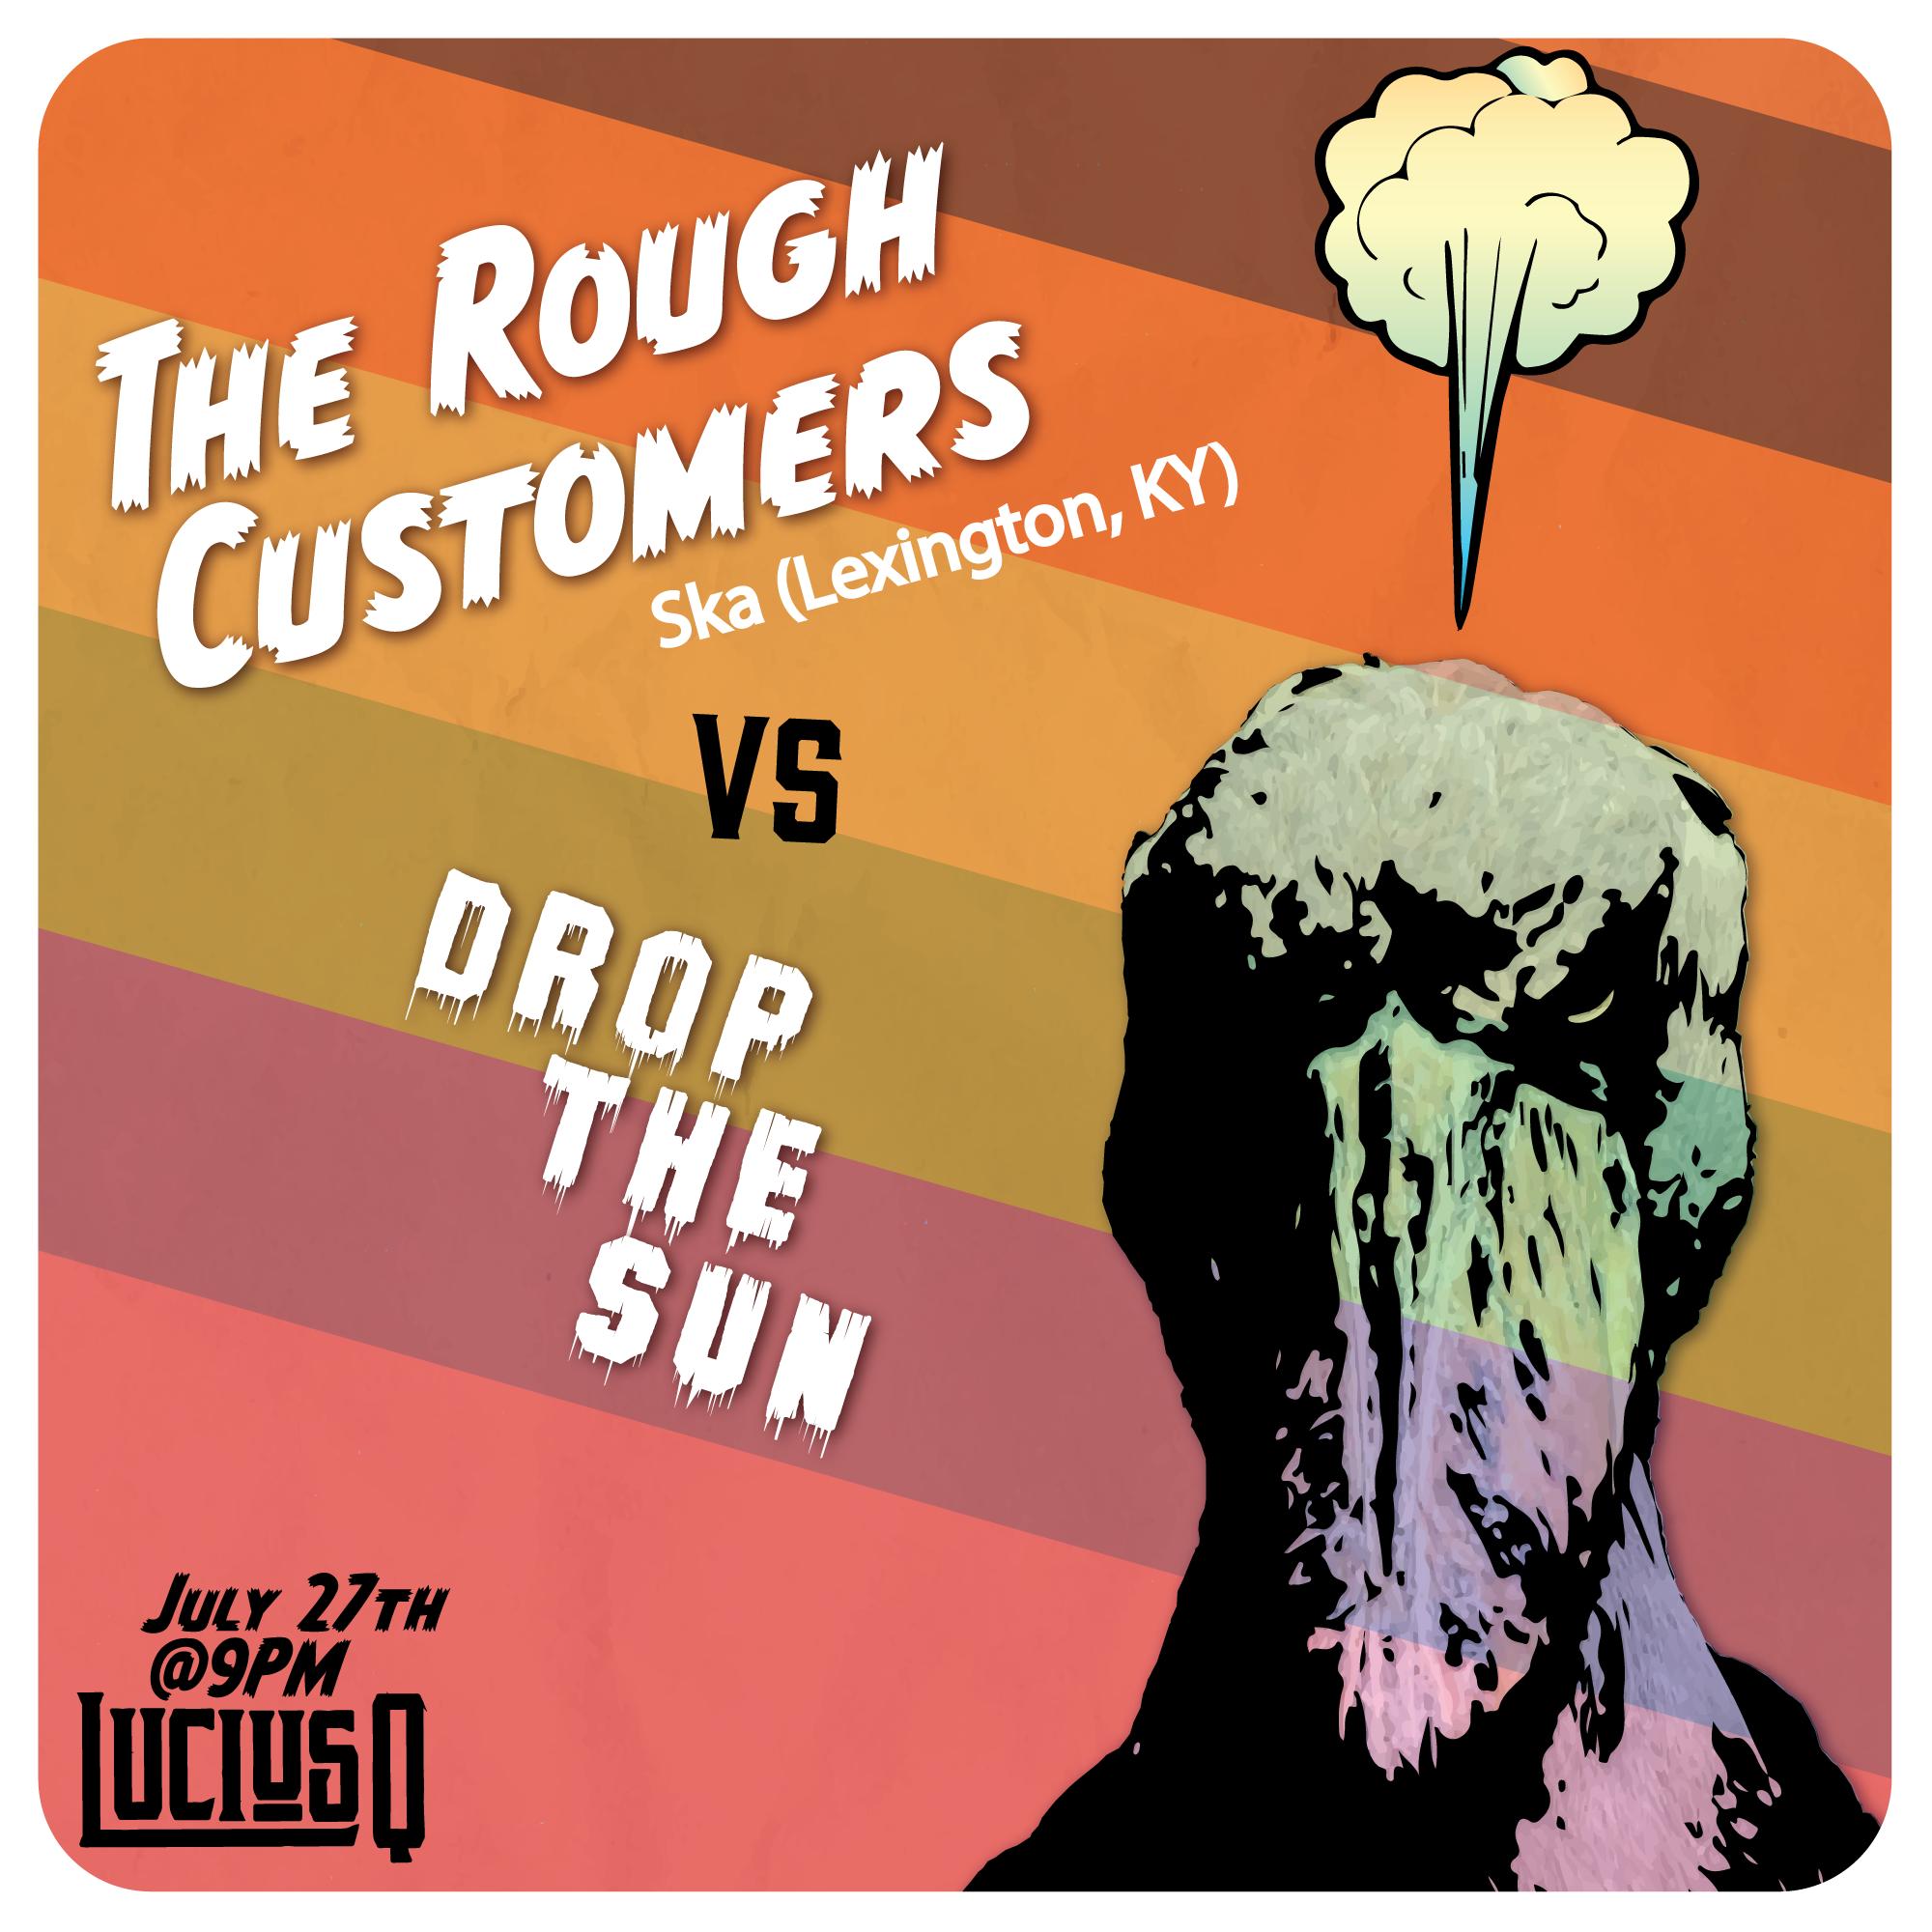 FiR-Creative---LuciusQ---The-Rough-Customers.png